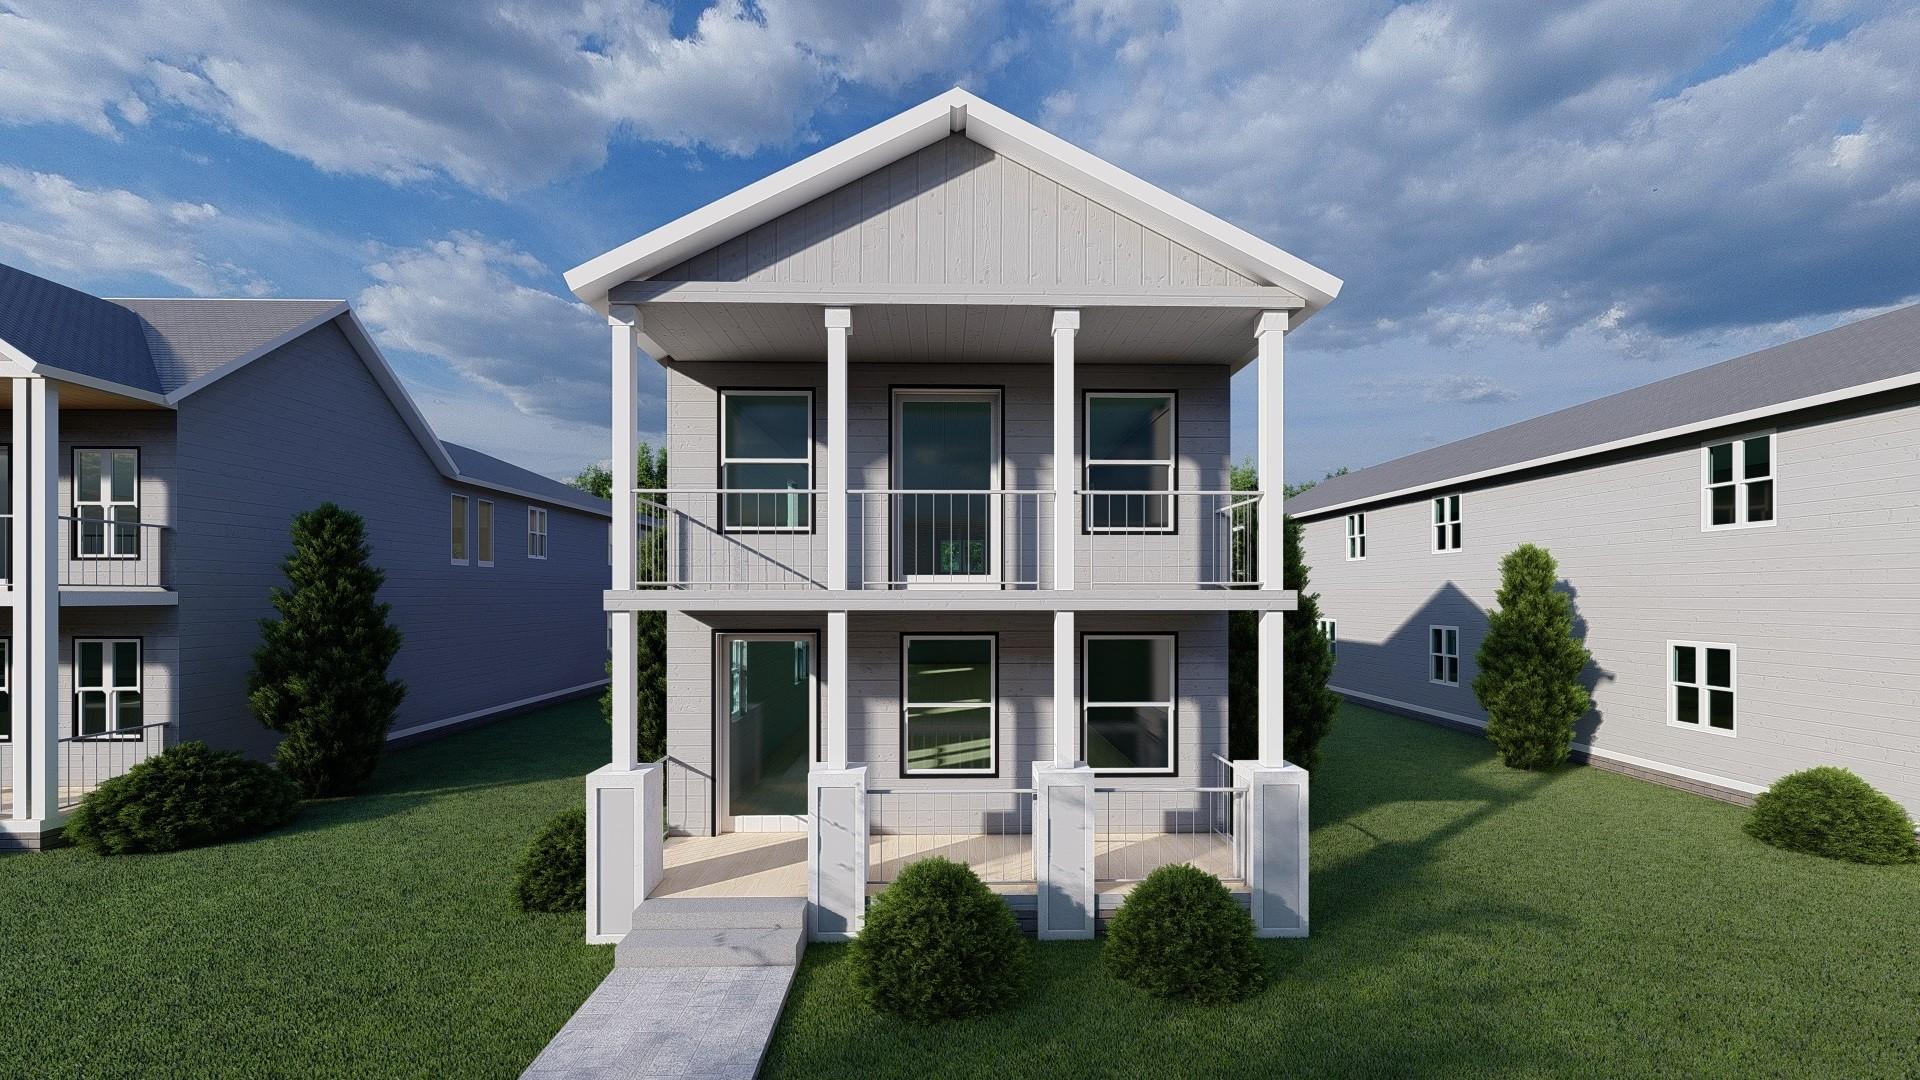 6102 New York Ave Unit A Property Photo - Nashville, TN real estate listing